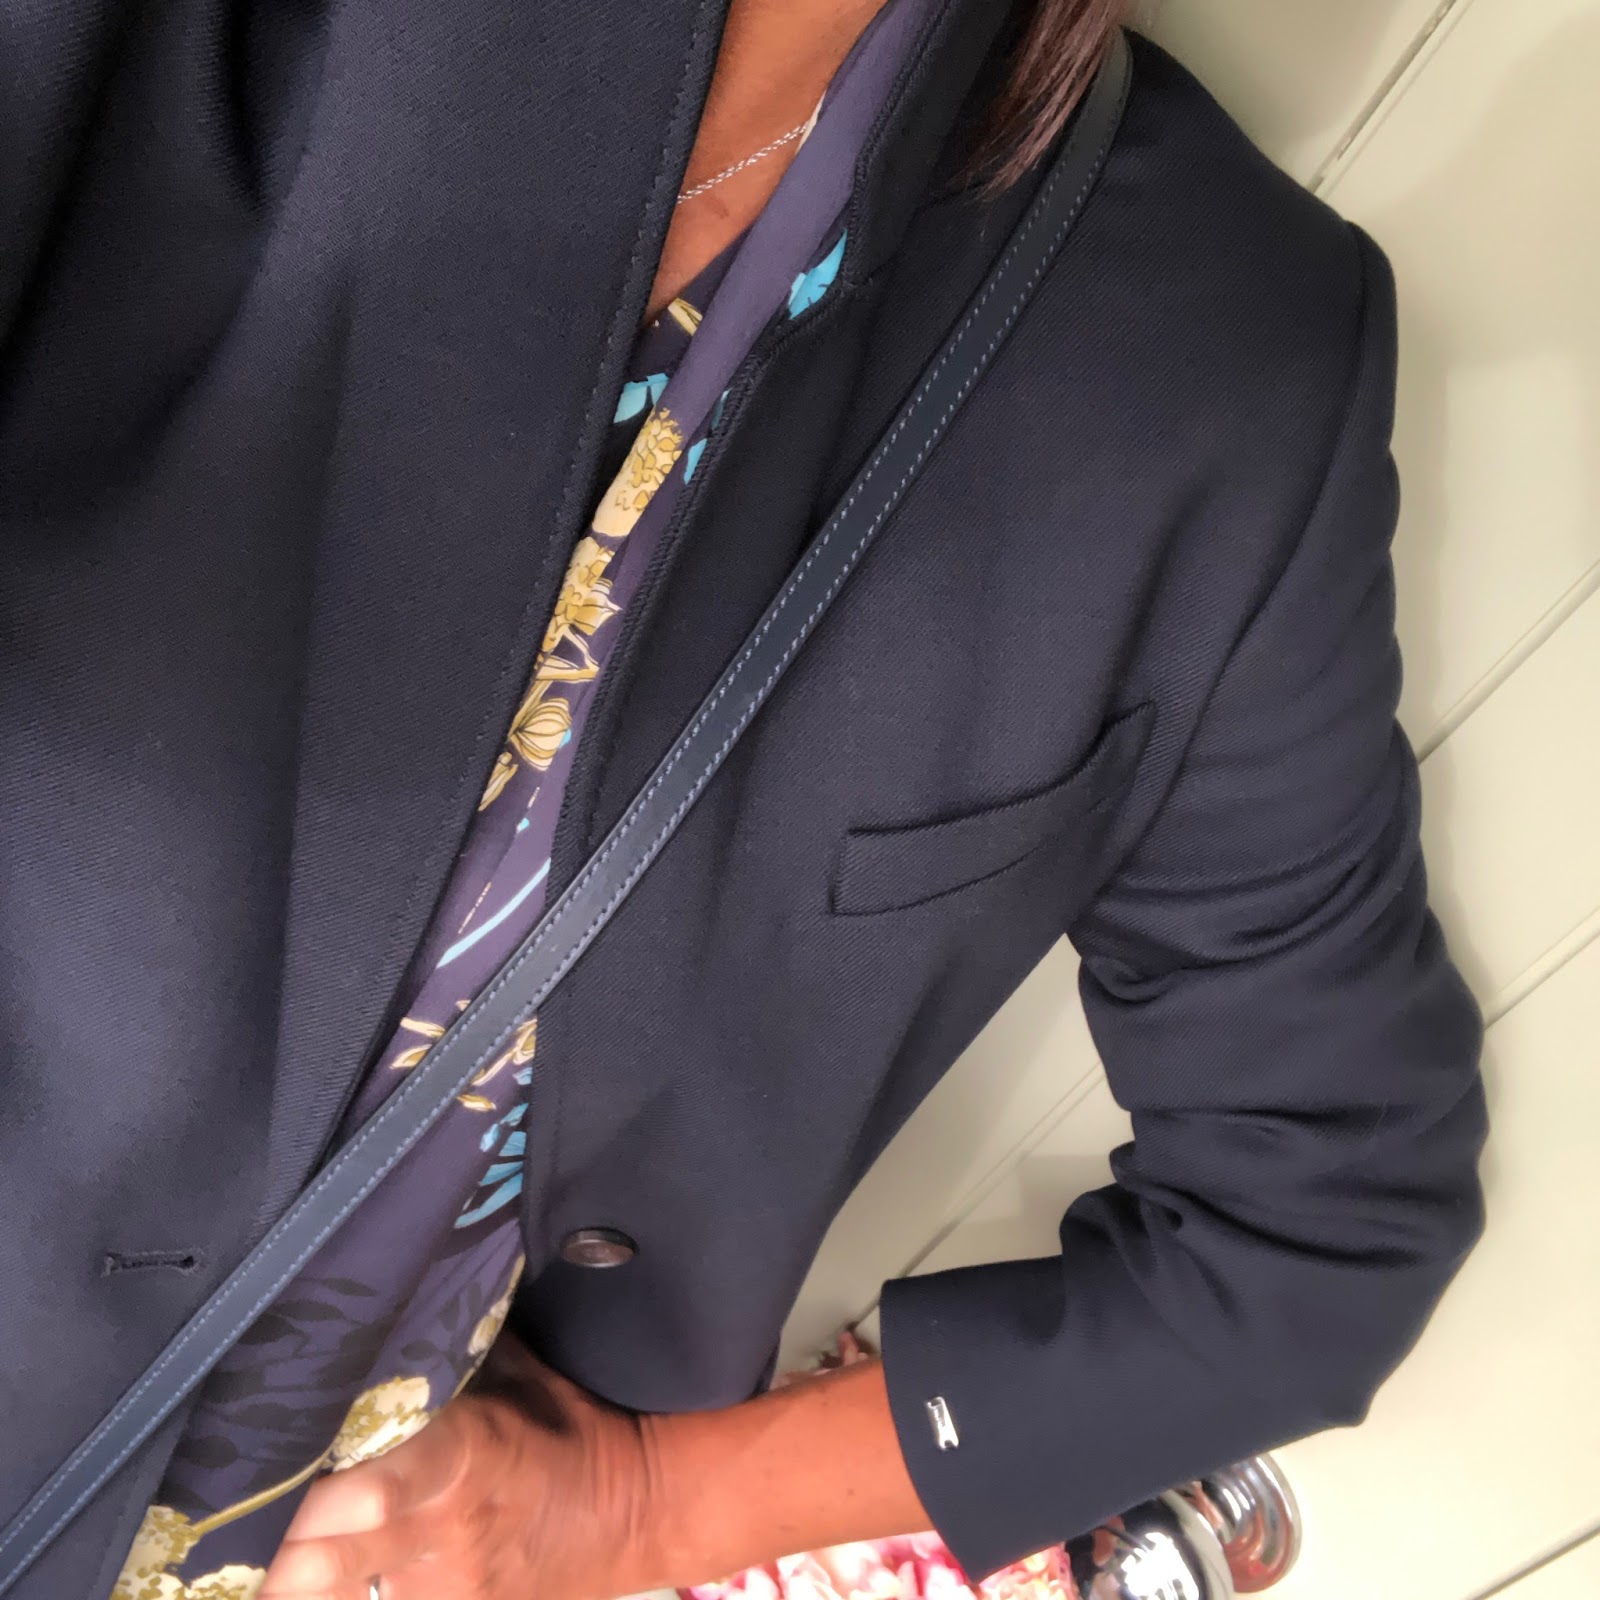 my midlife fashion, house of fraser, tommy hilfiger celeste coat, golden goose superstar low top leather trainers, iris and ink leather shoulder bag, marks and spencer long sleeve maxi dress